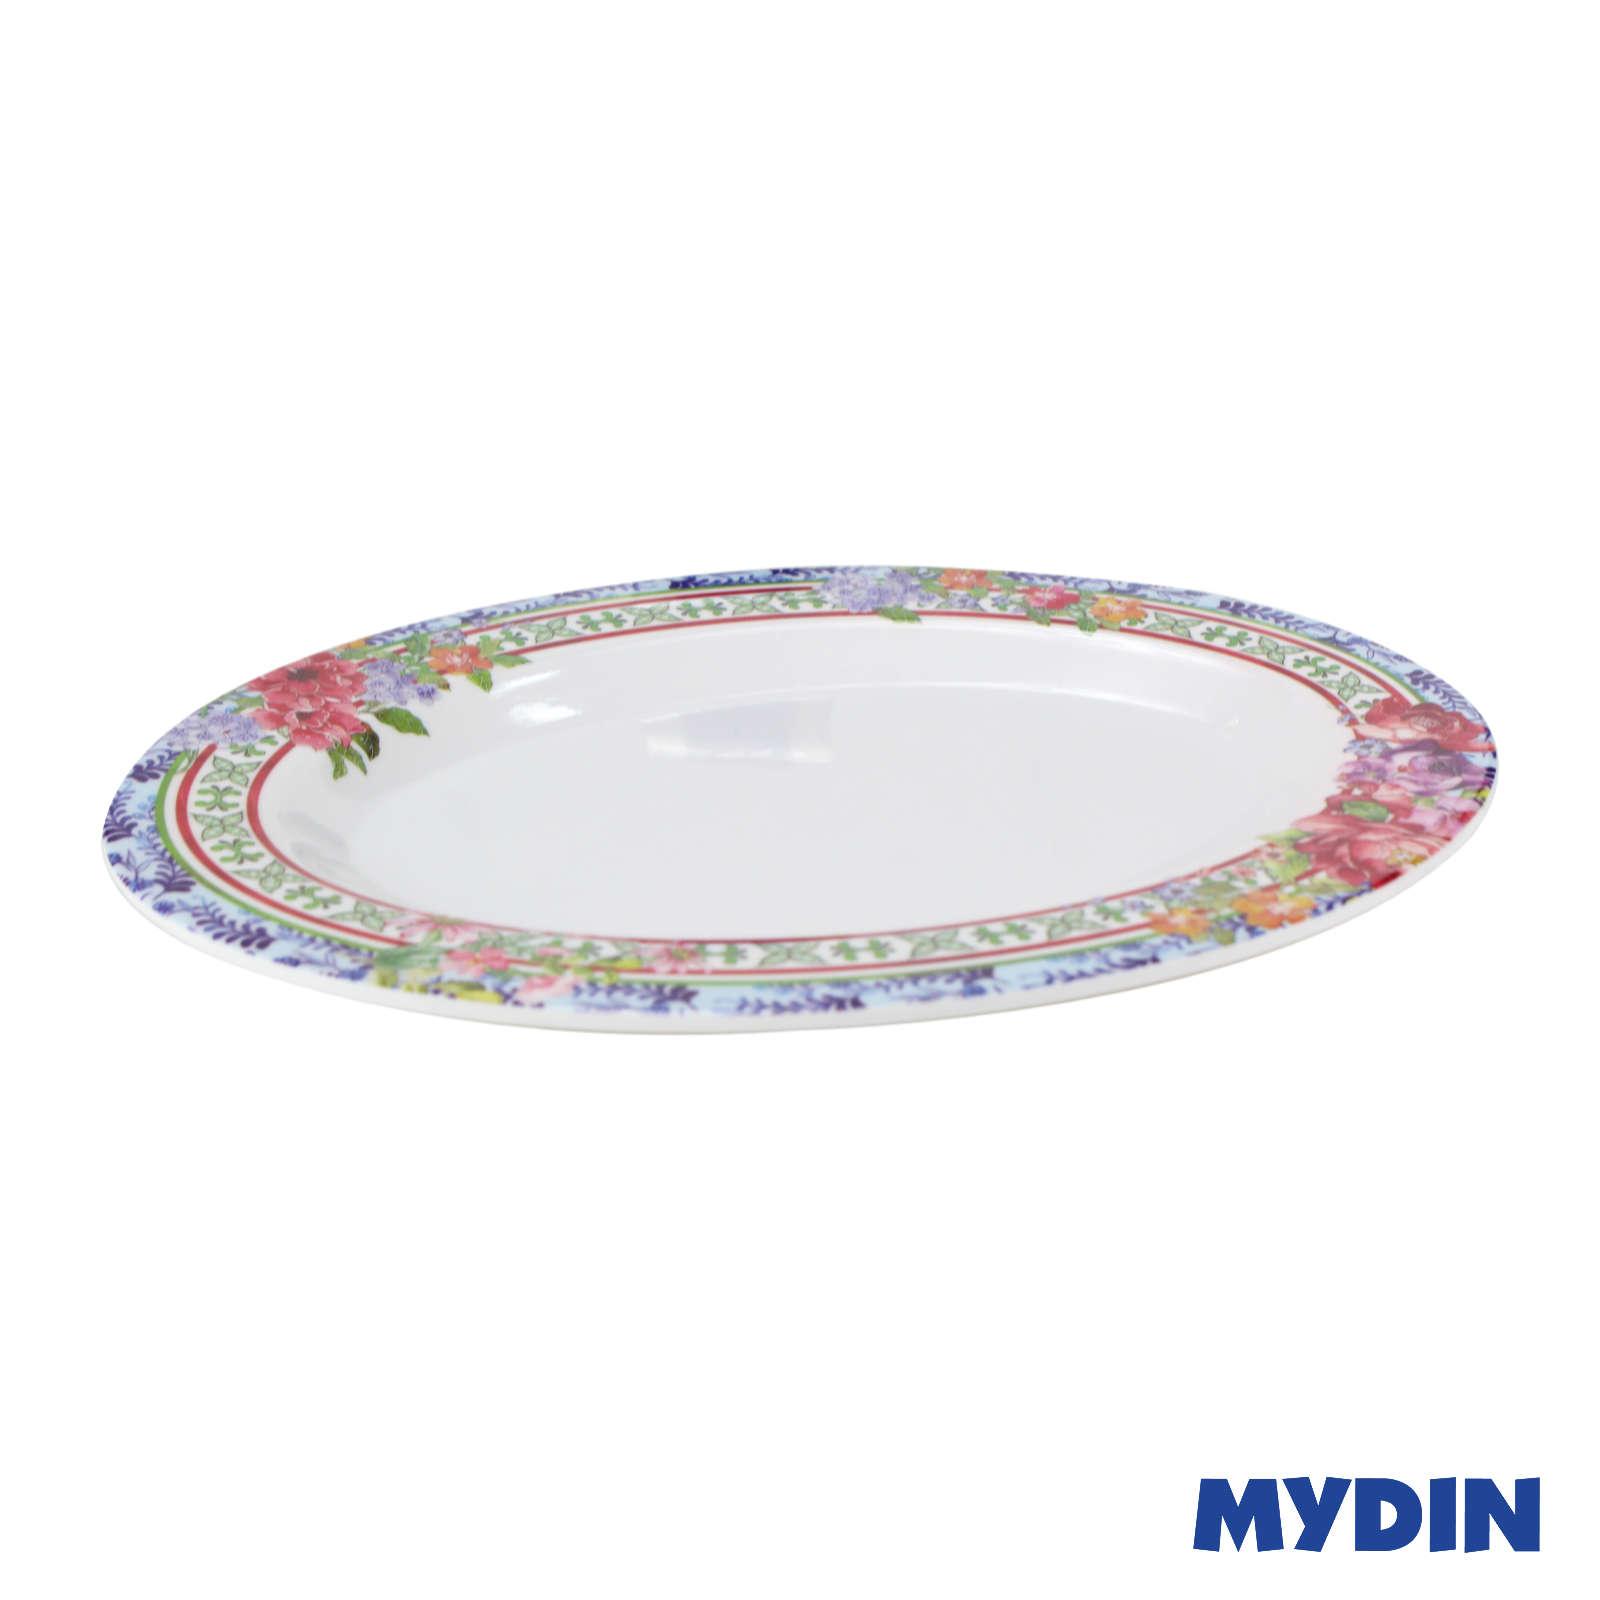 My Home Melamine Oval Plate 10In FR HP-OV-10